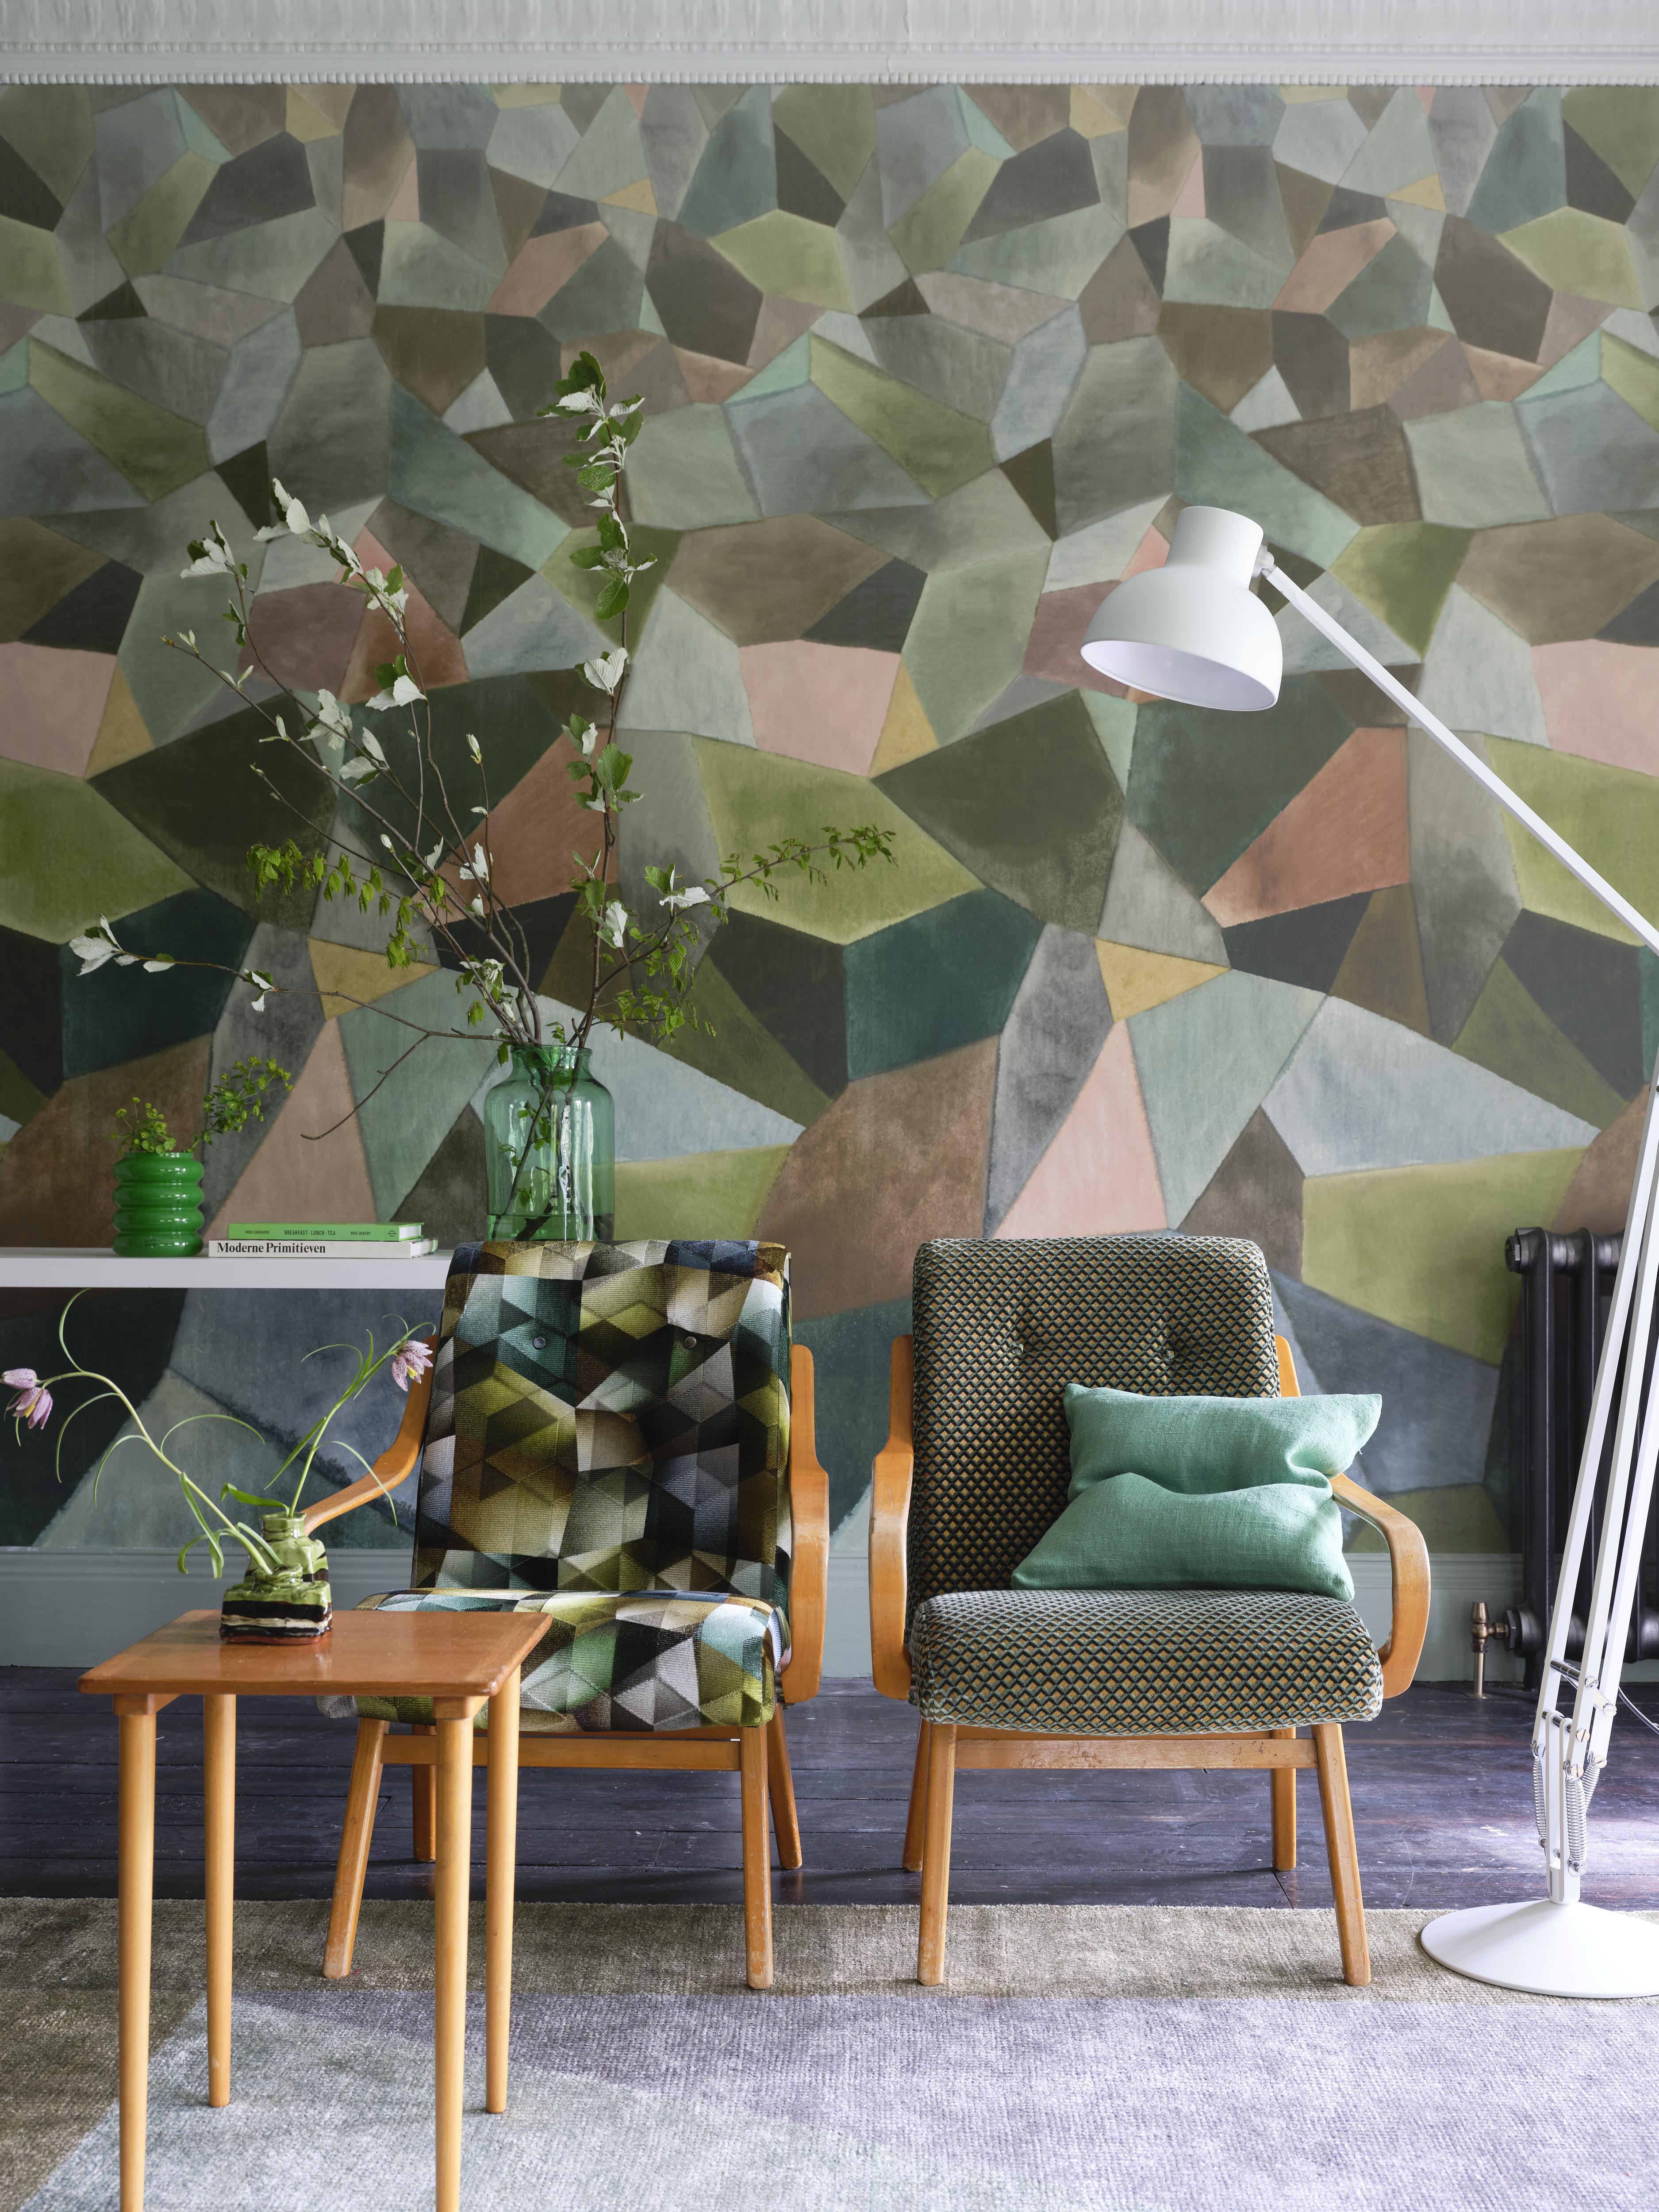 Mural panorámico de diseño geométrico